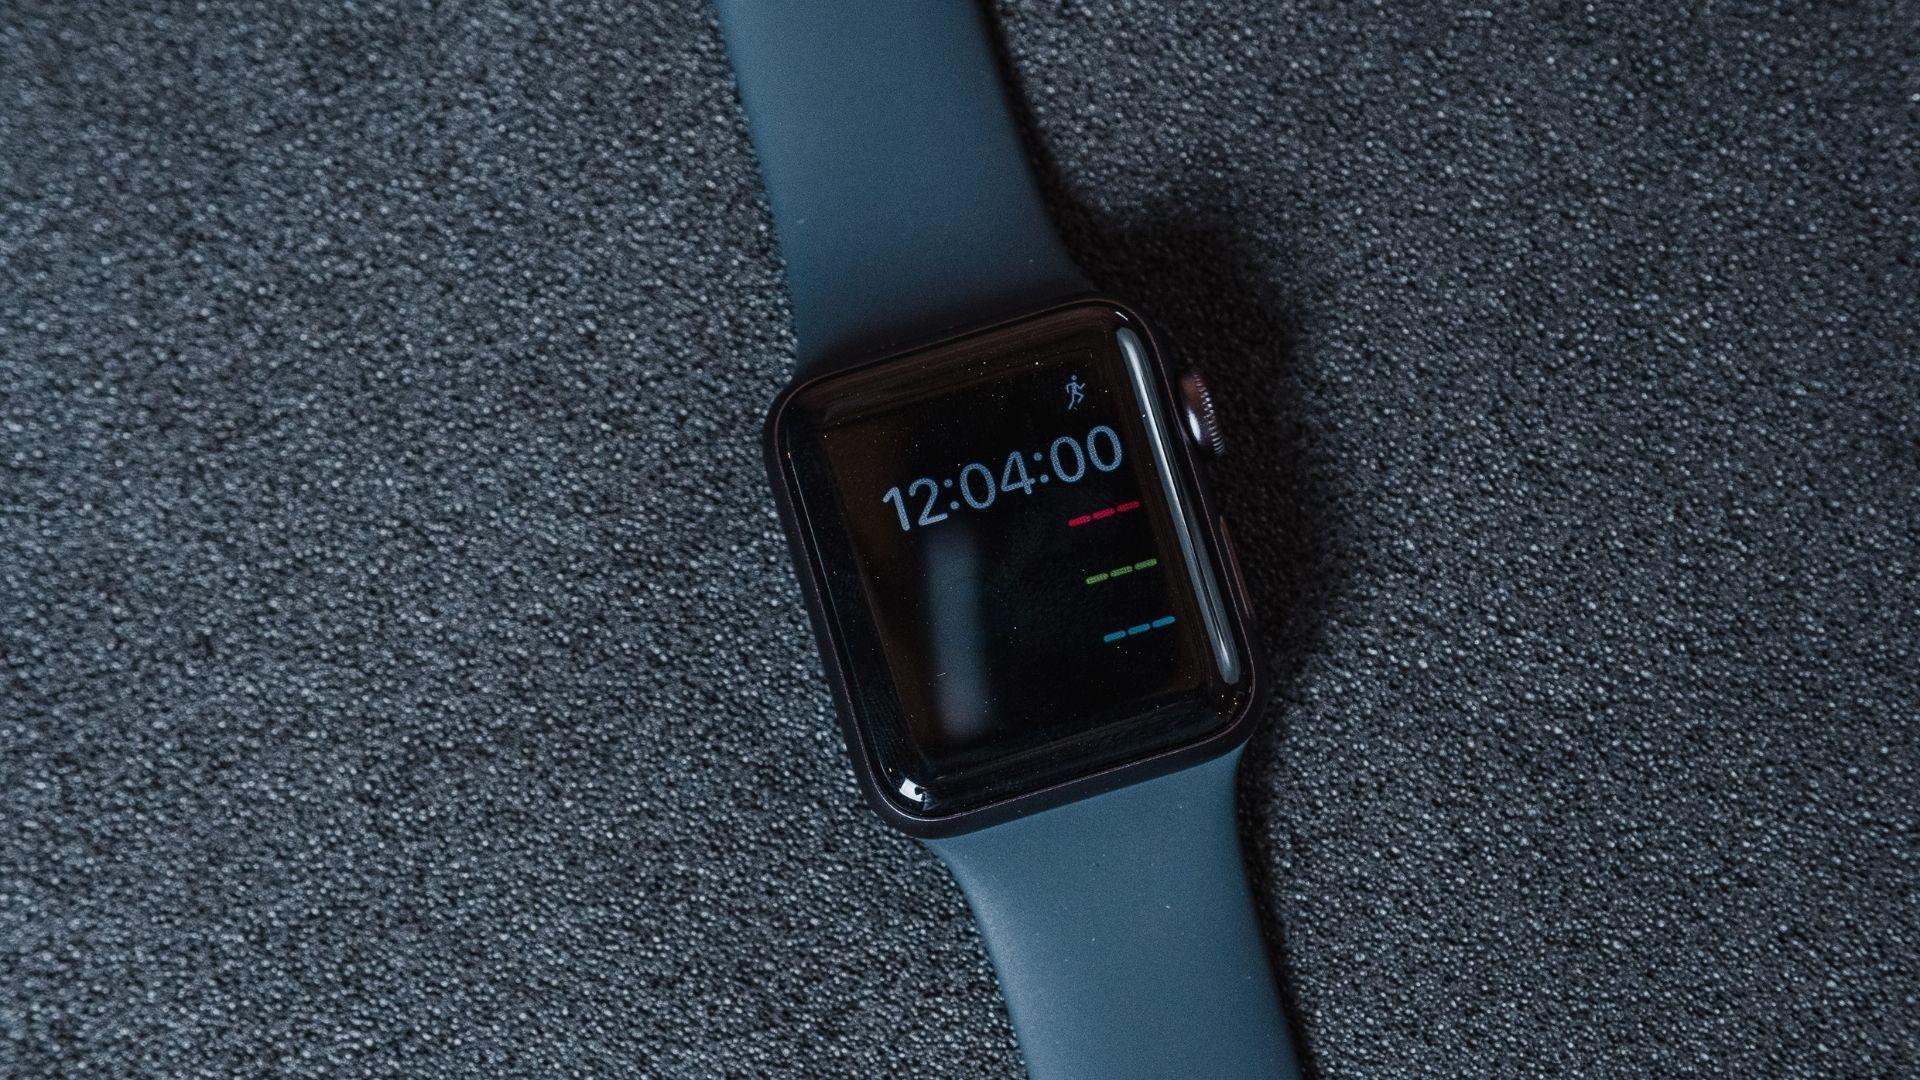 Tela do Apple Watch 3 acesa marcando 12:04